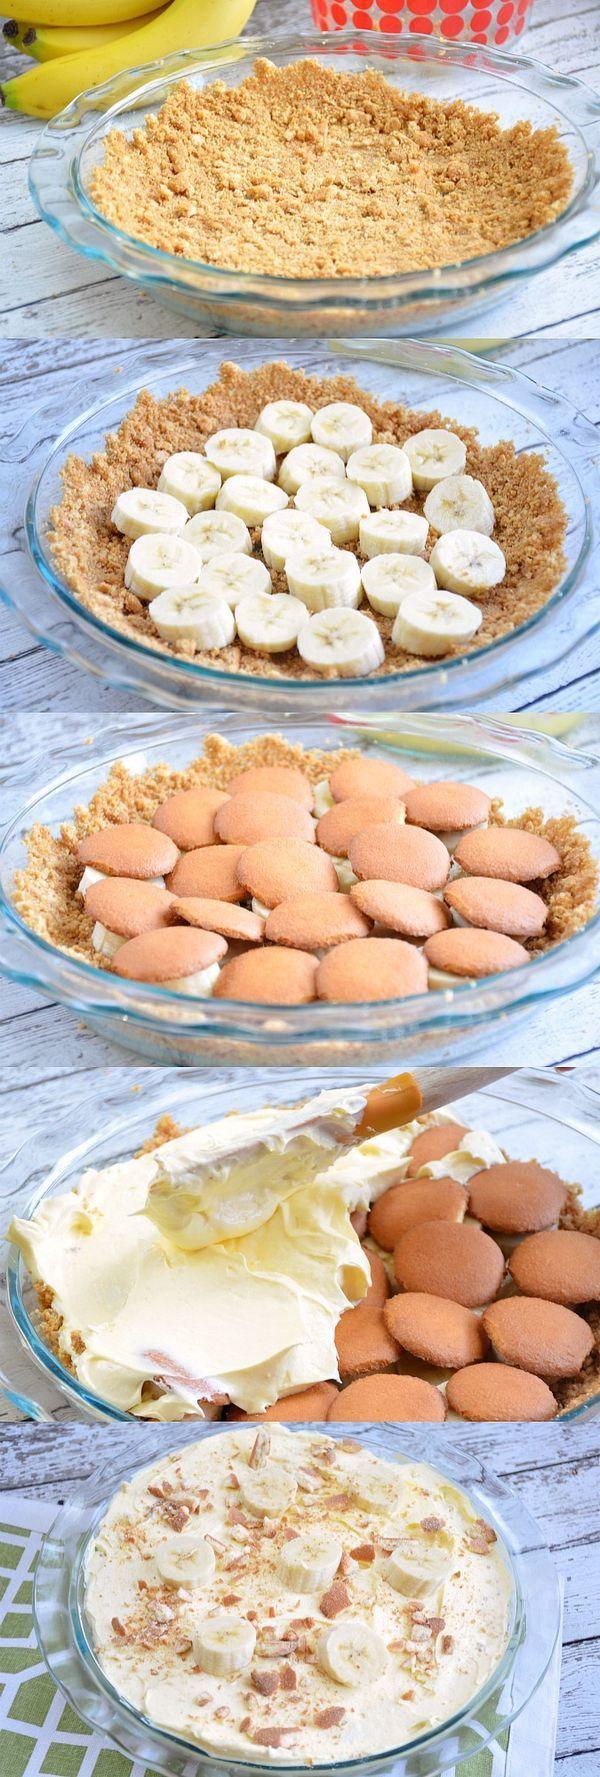 No-Bake Banana Nilla Pie - A childhood favorite!